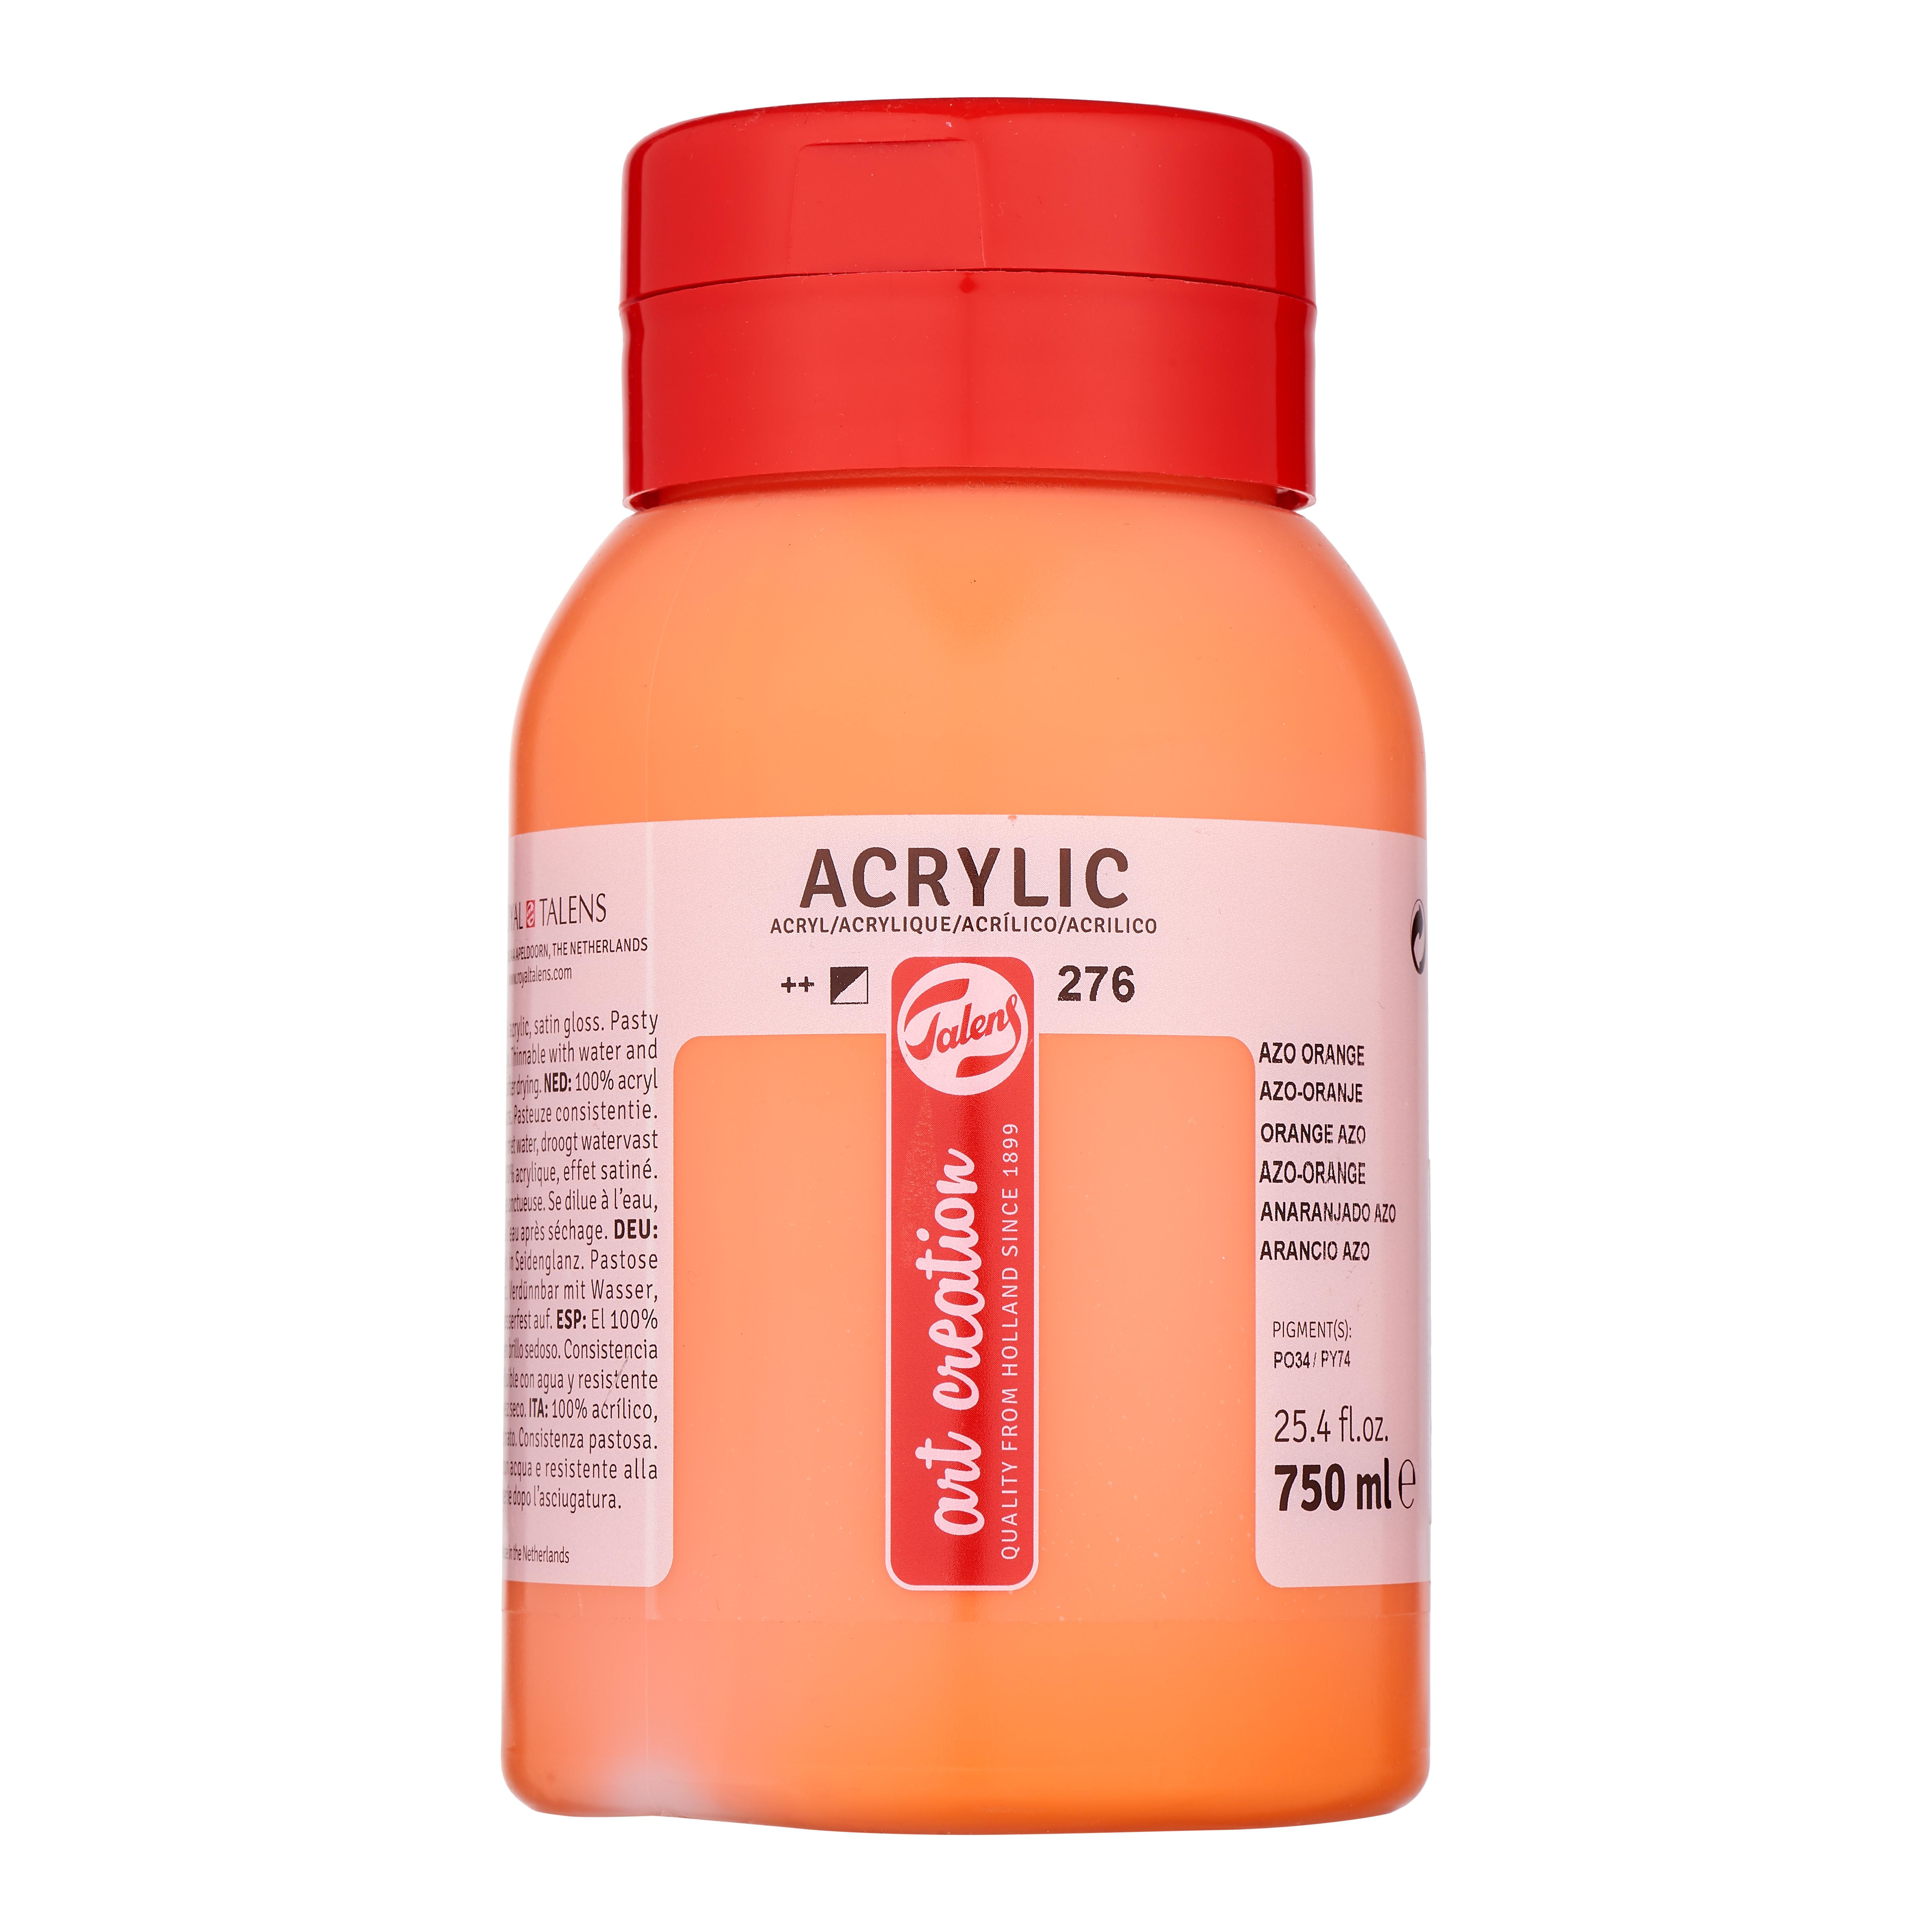 Talens Art Creation Acrylic Colour Bottle 750 ml Azo Orange 276